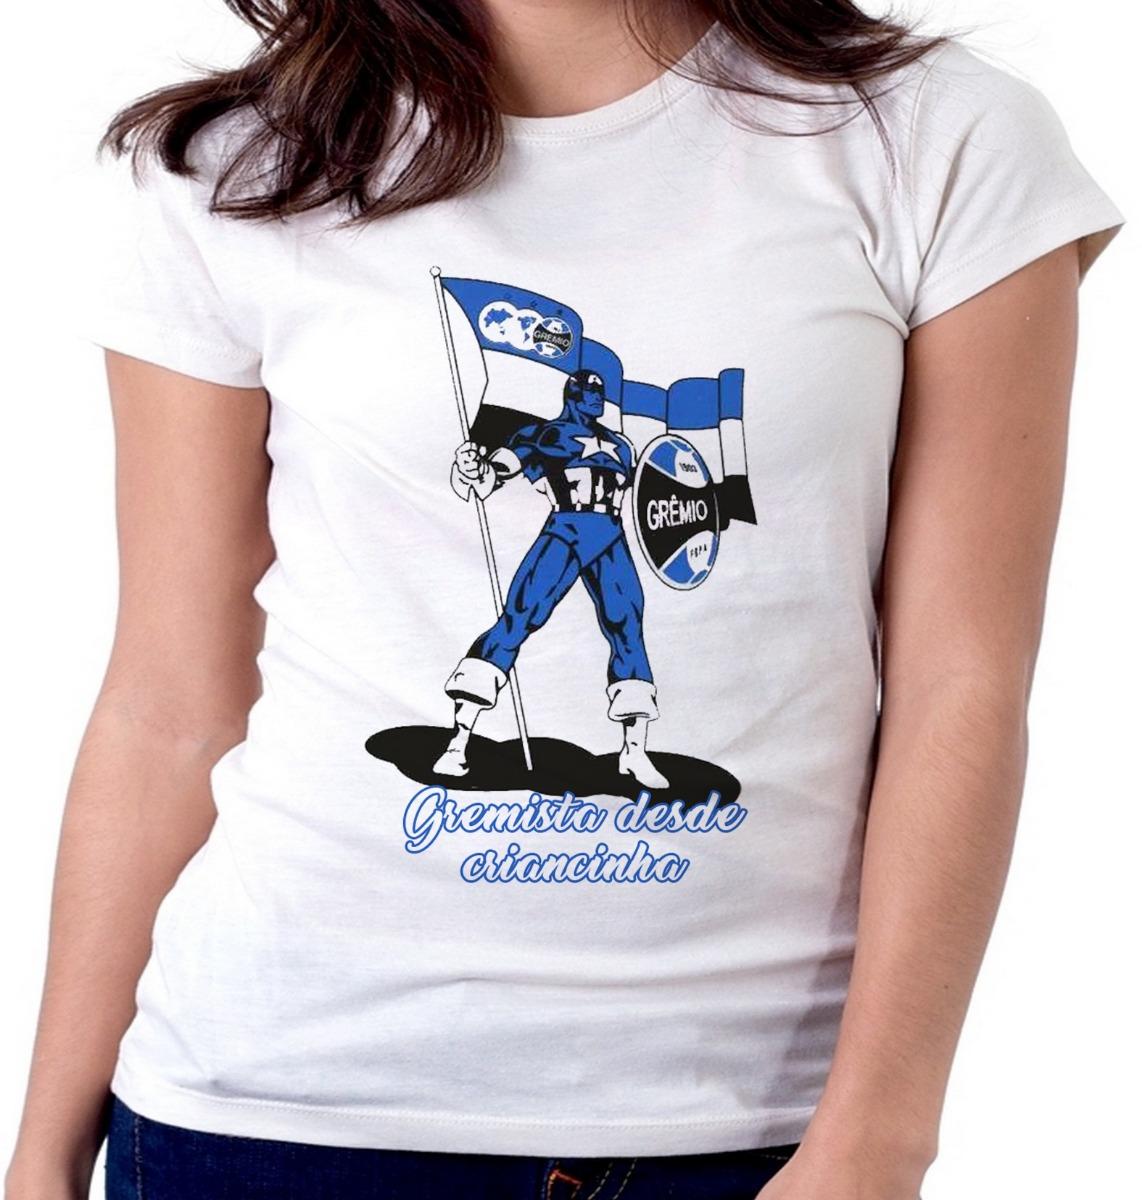 blusa camiseta feminina baby look gremista gremio torcida. Carregando zoom. d6ca506b91040